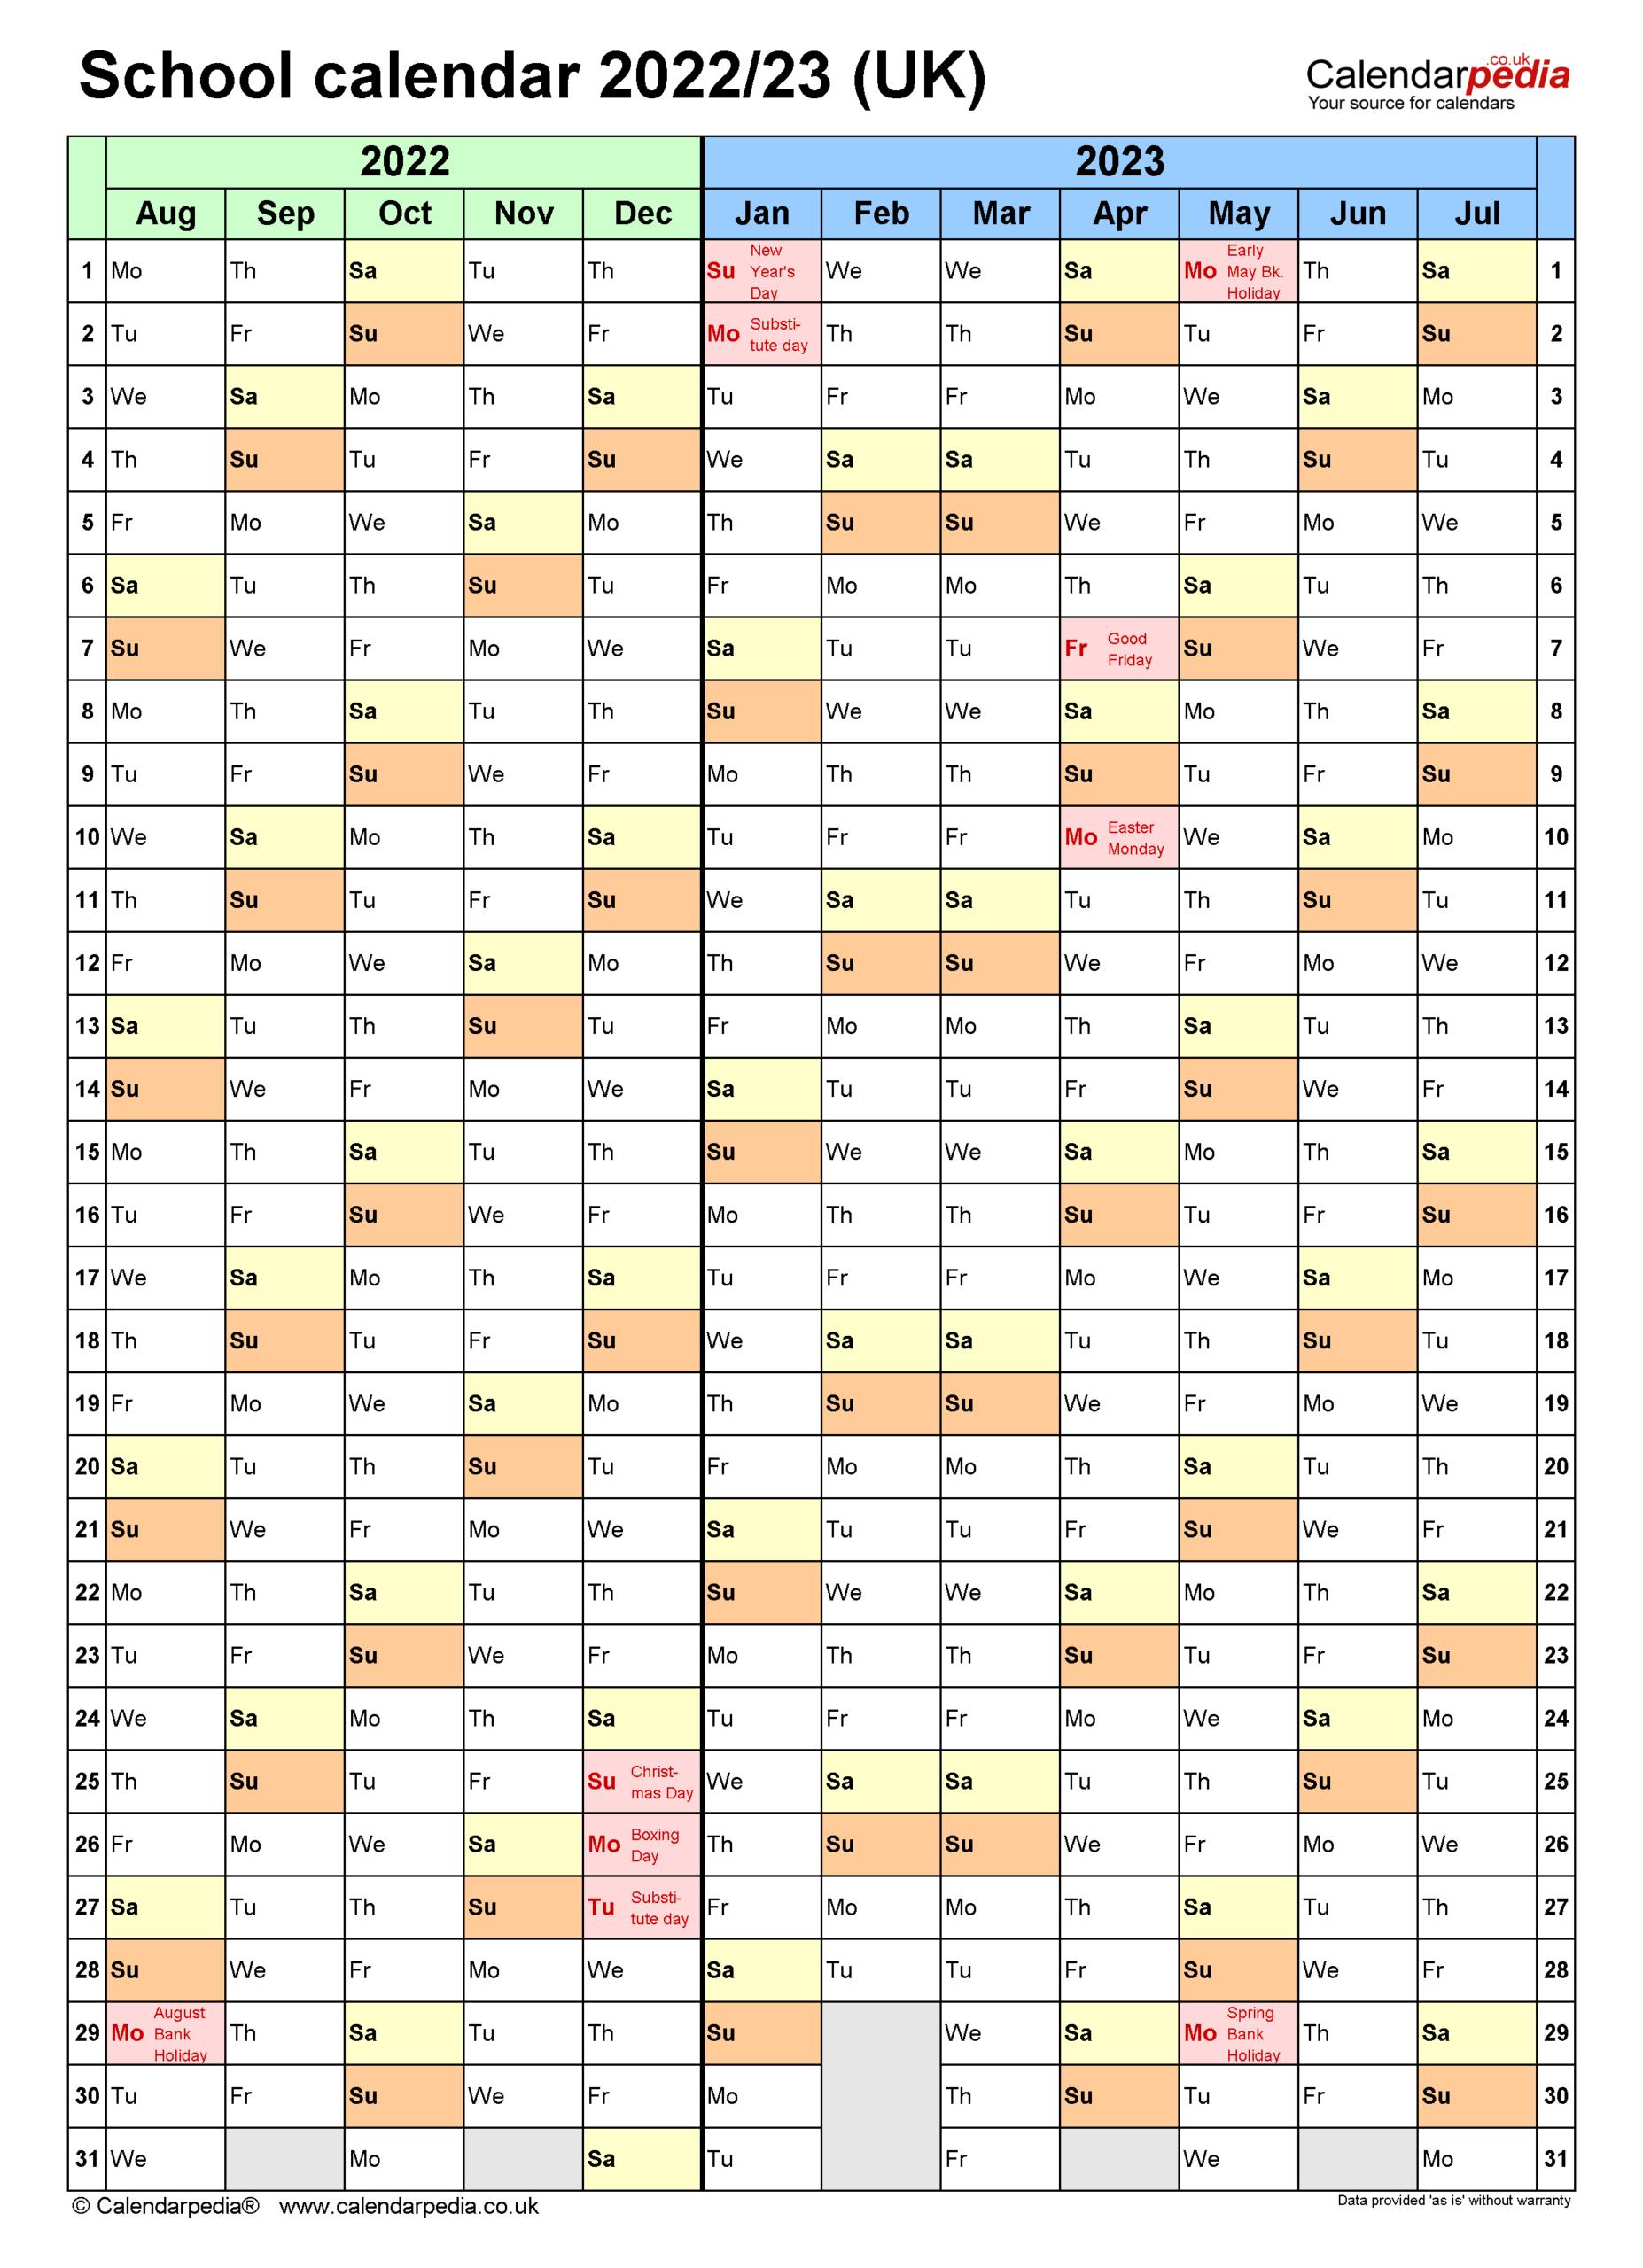 School Calendars 2022/2023 As Free Printable Word Templates inside Aiken County 2022 2023 School Calendar